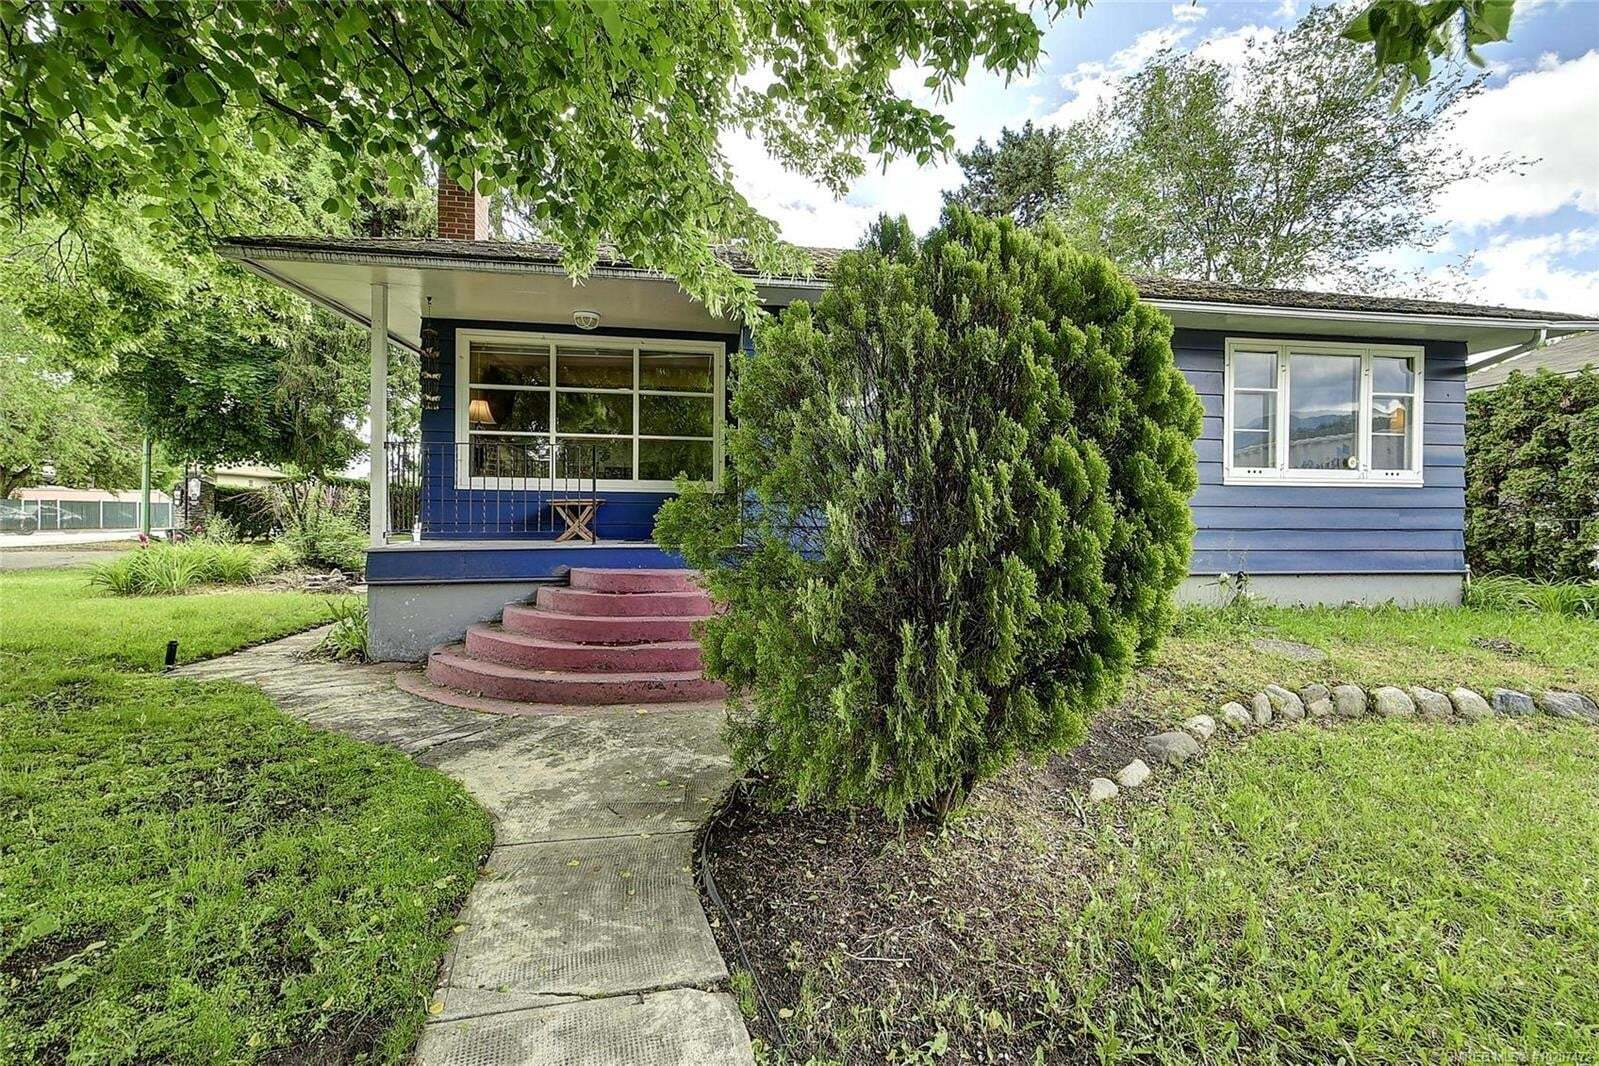 House for sale at 481 Cadder Ave Kelowna British Columbia - MLS: 10207472